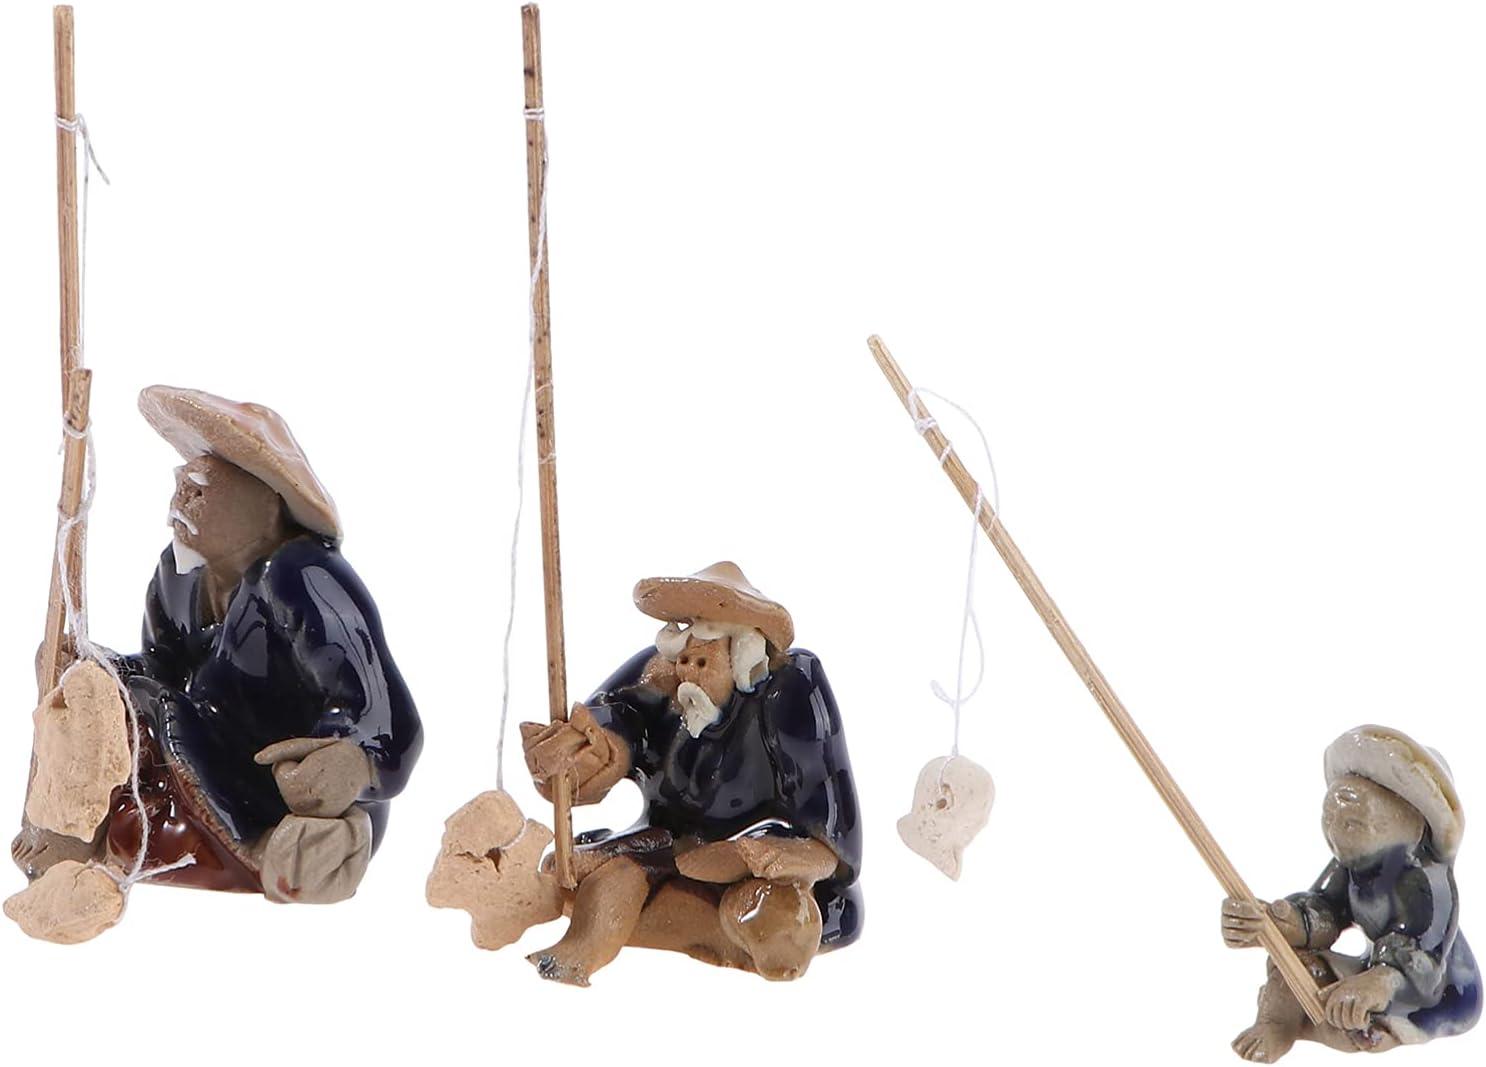 DOITOOL Shipping 35% OFF included 3pcs Miniature Fairy Garden Figurine Fisherman Old Aquar